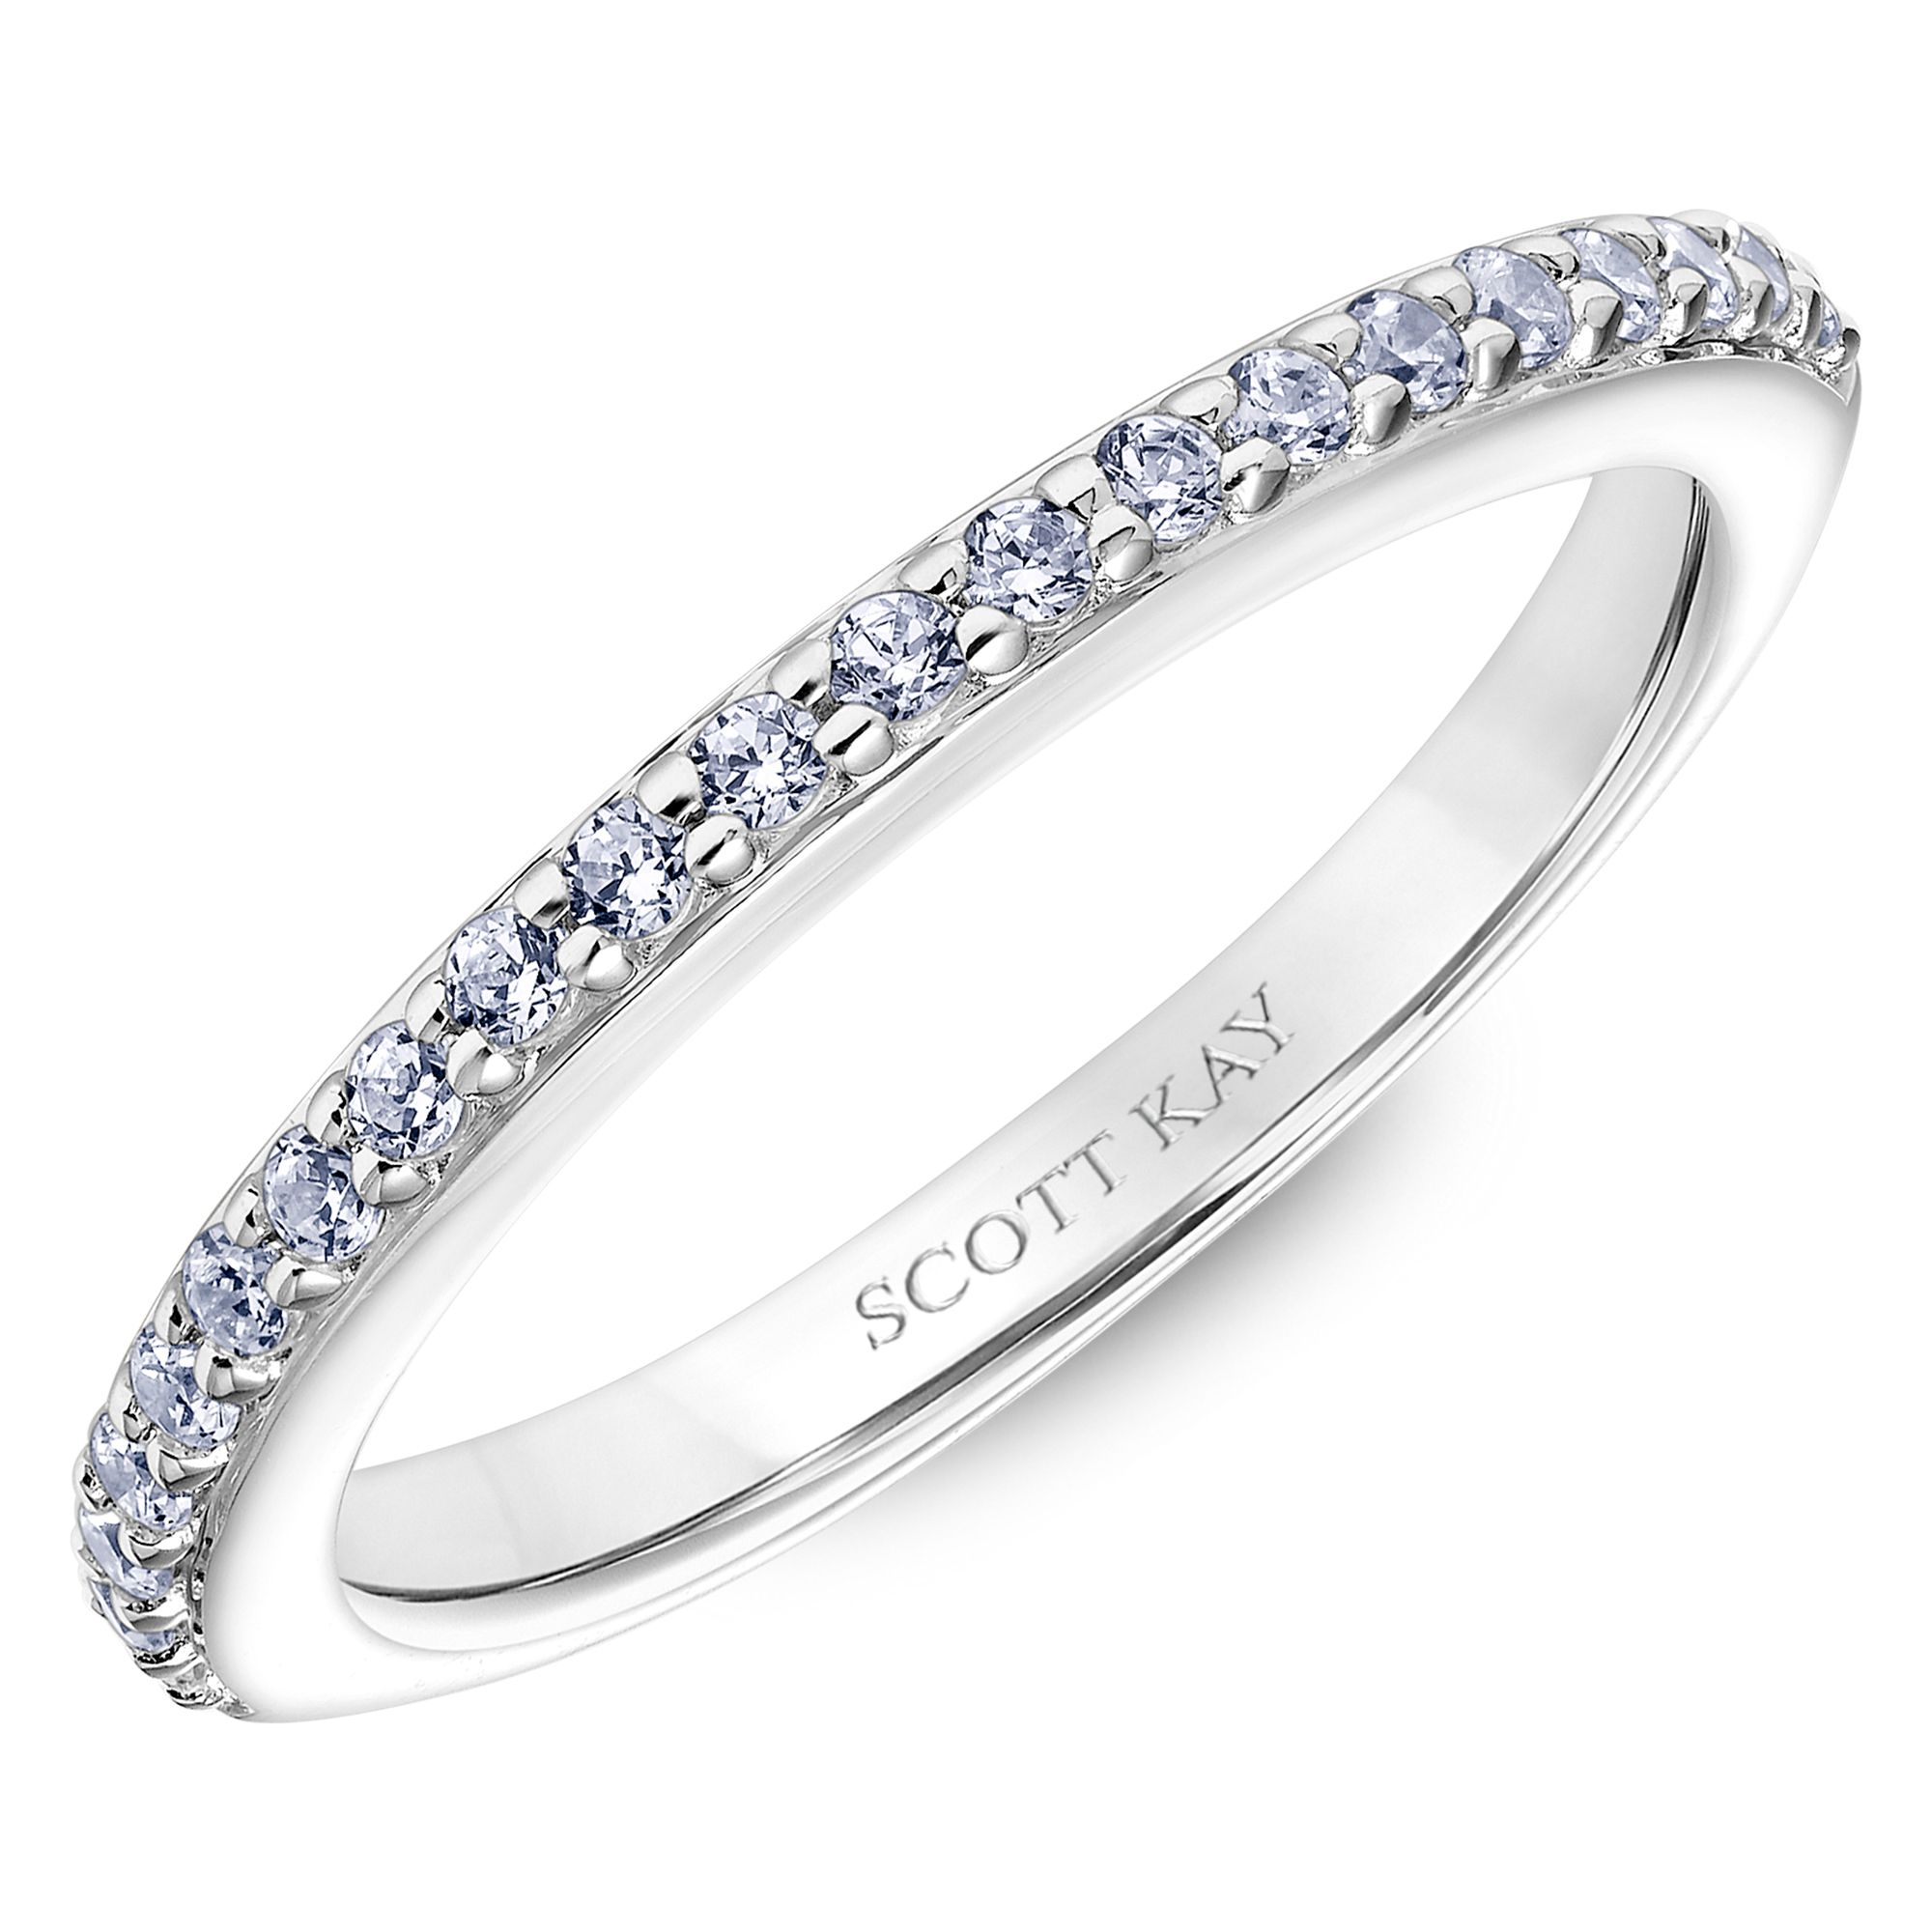 31SK6035PL Platinum diamond wedding band, Diamond